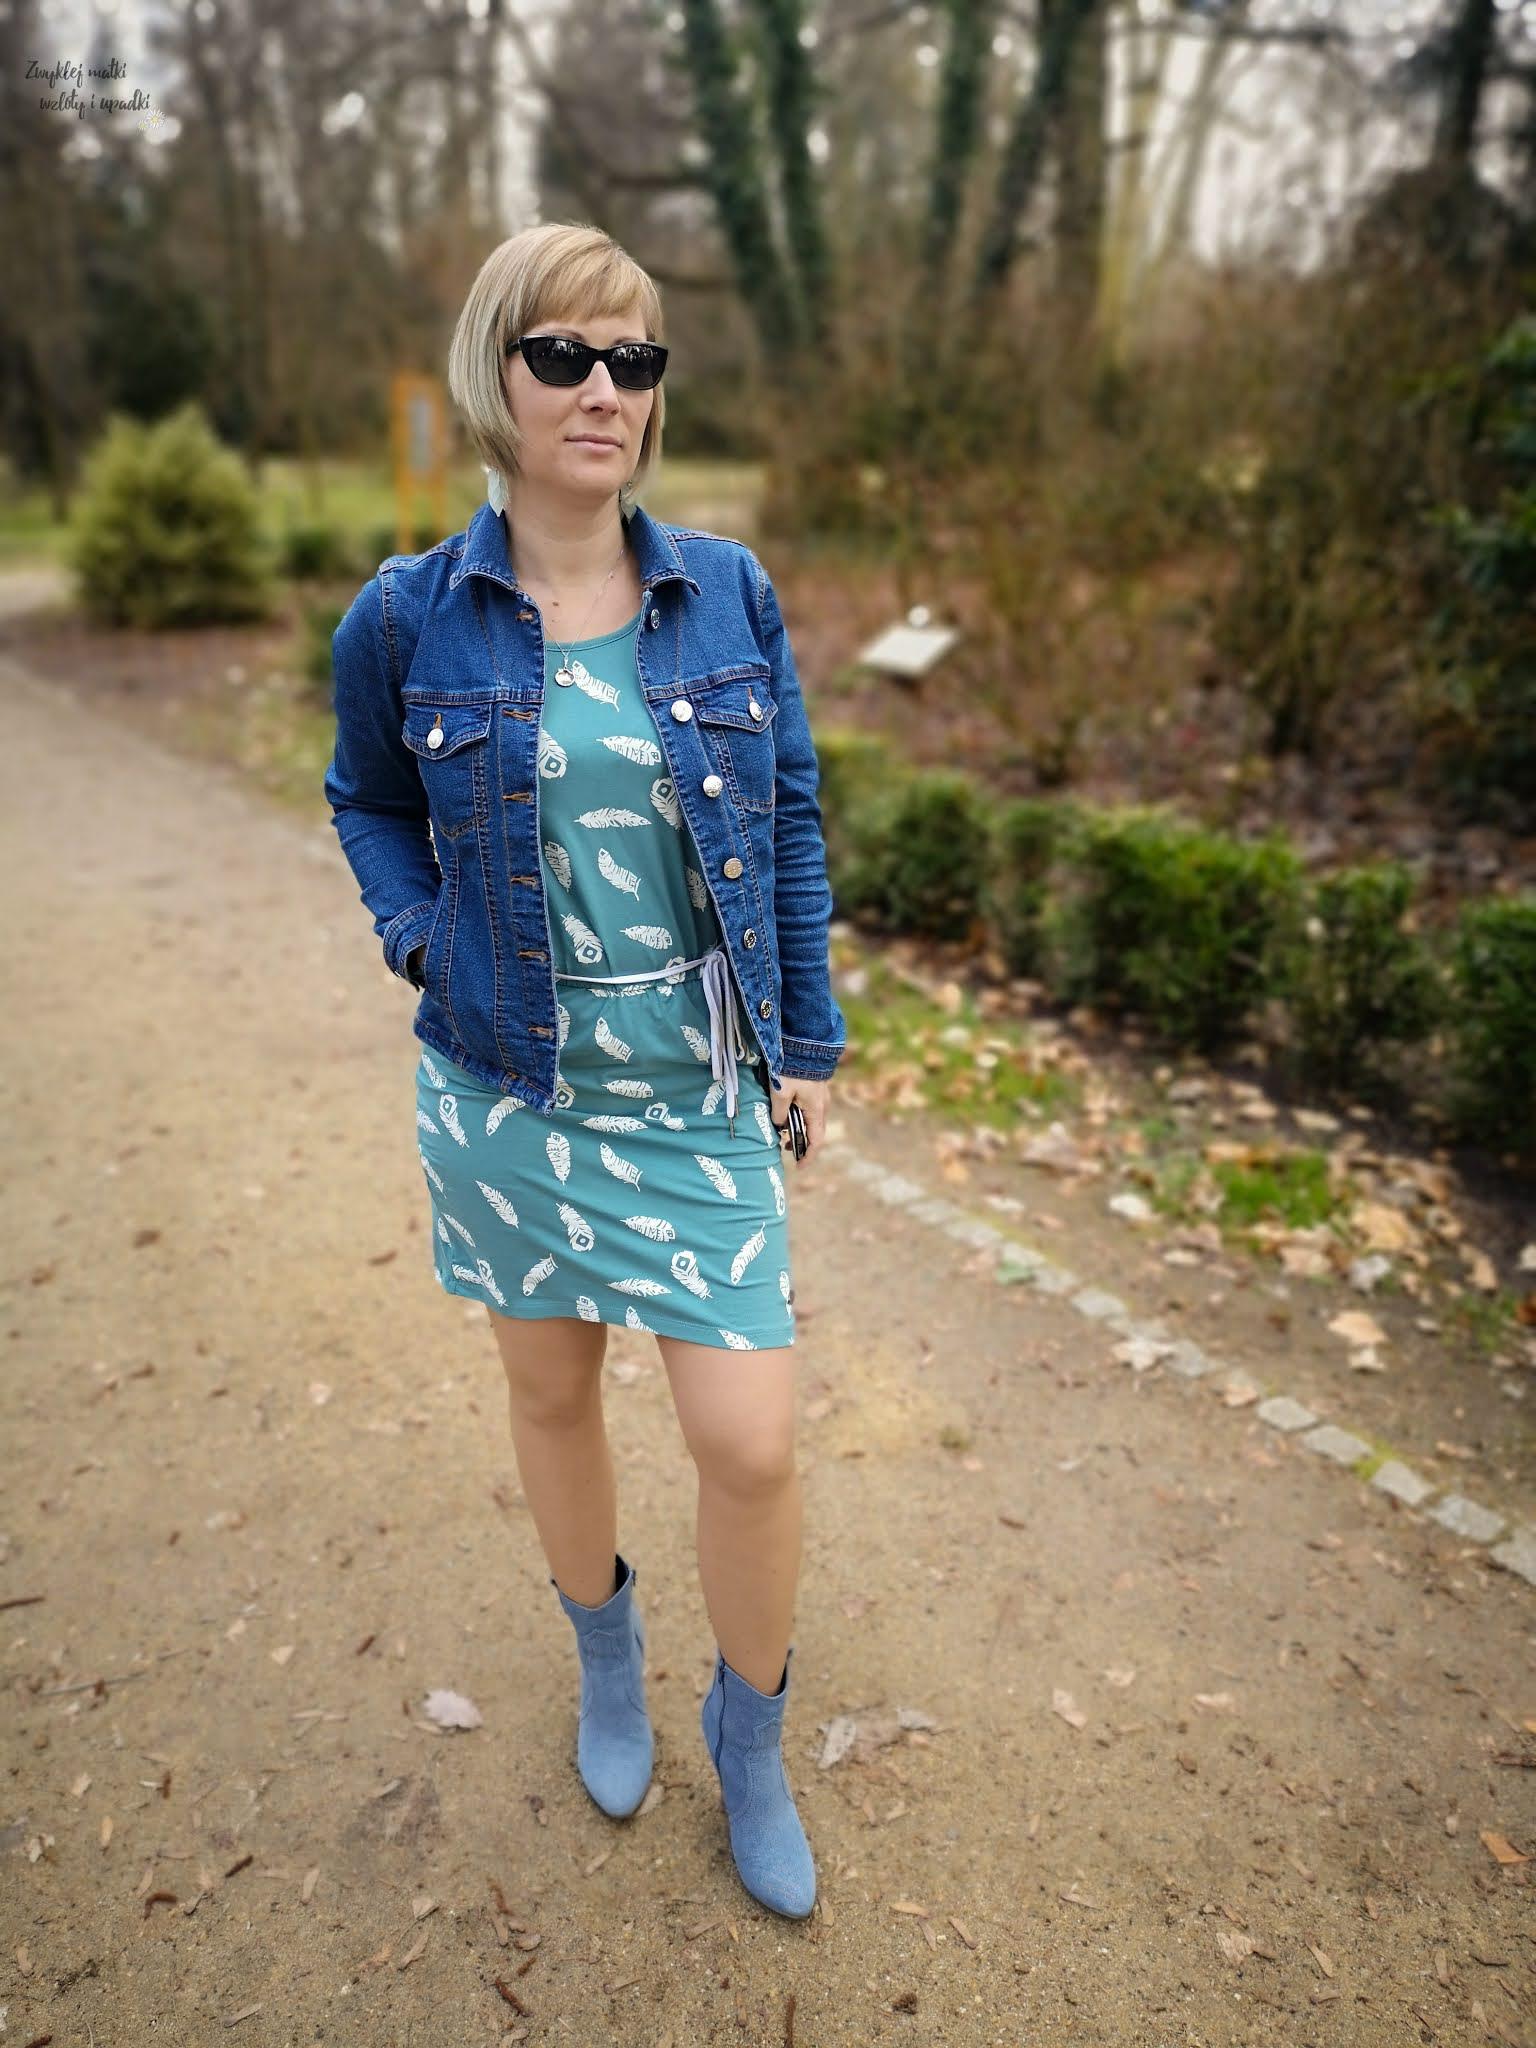 https://www.bonprix.pl/style/sukienka-shirtowa-1522196385/?catalogueNumber=910750&source=1